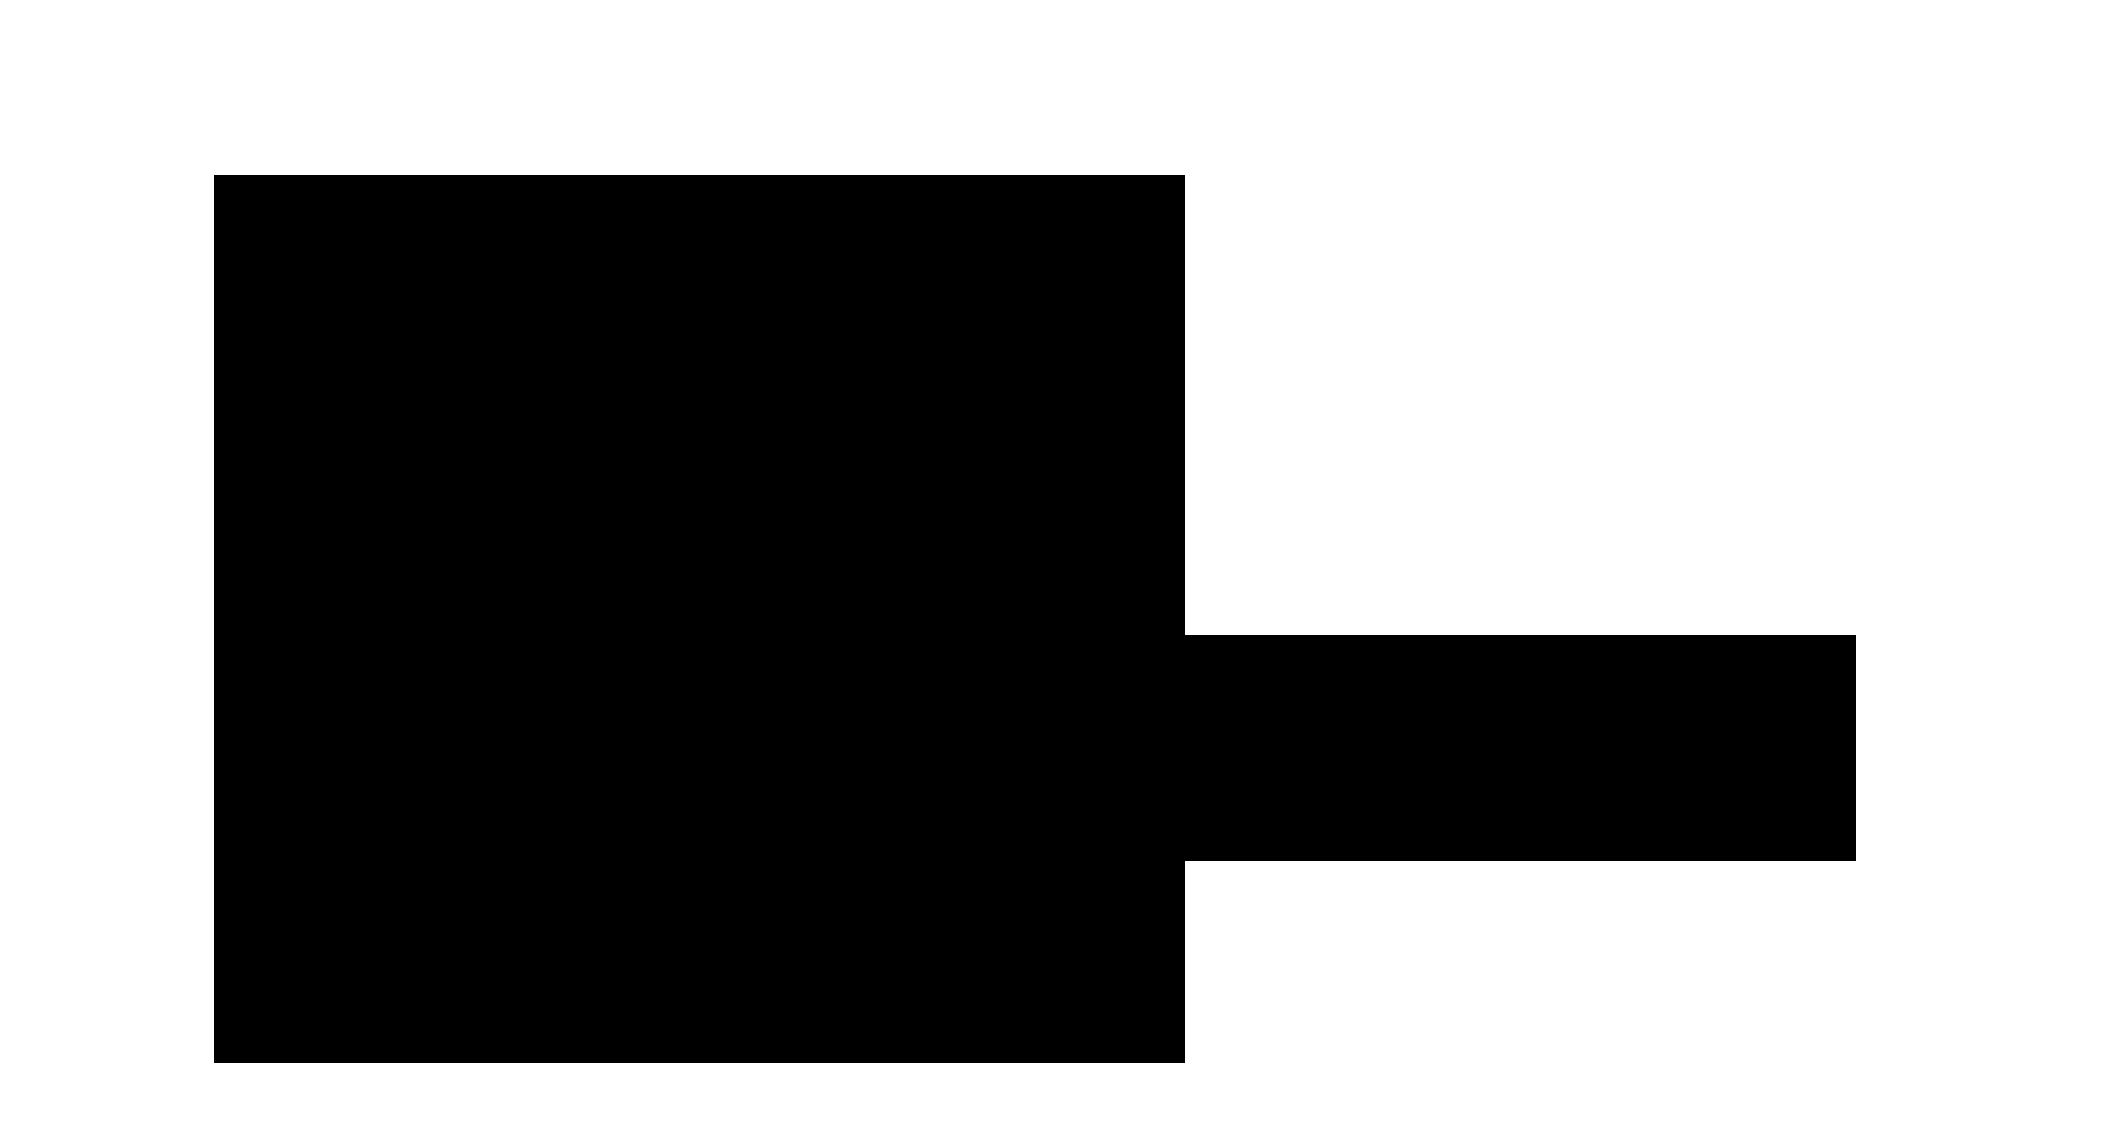 maha-munaf-contact